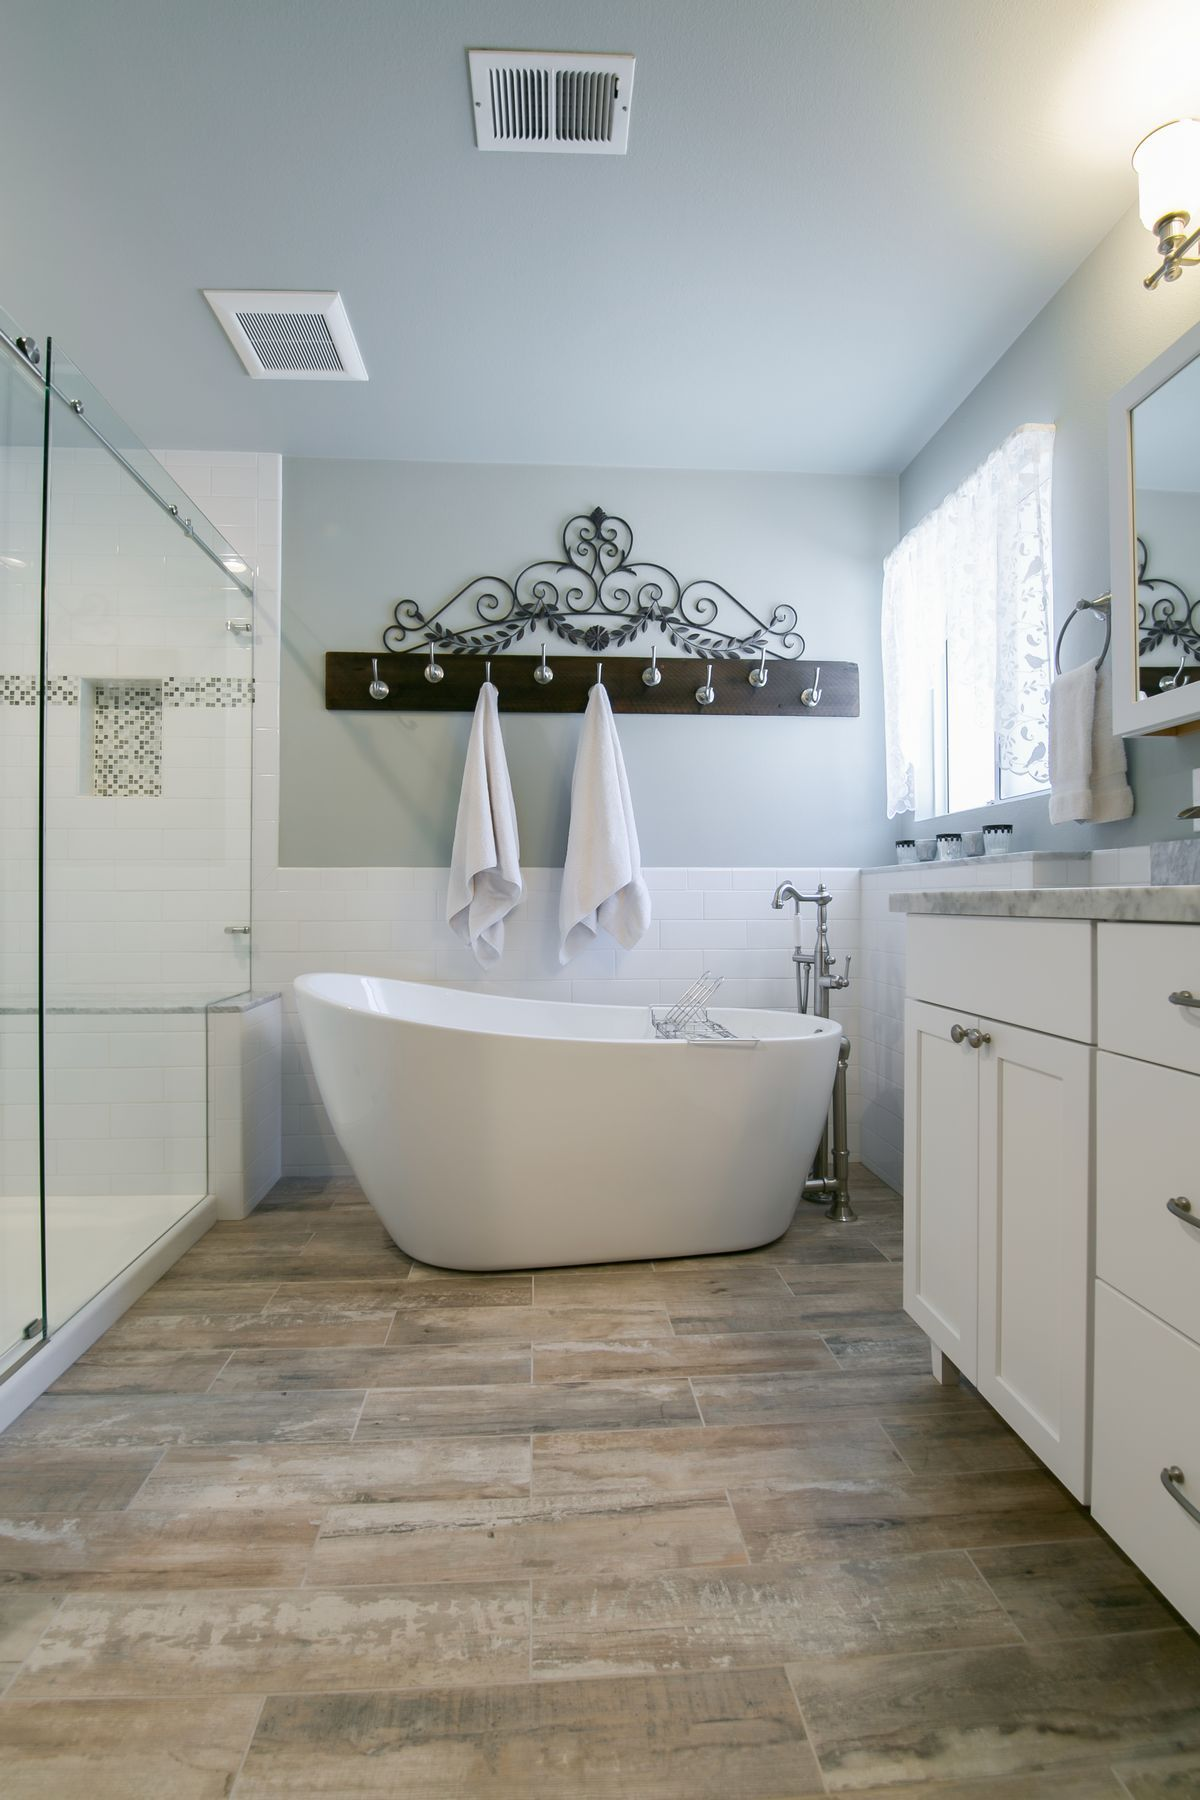 Bathrooms » Palazzo Kitchens & Baths Remodeling   Bathroom Remodel ...